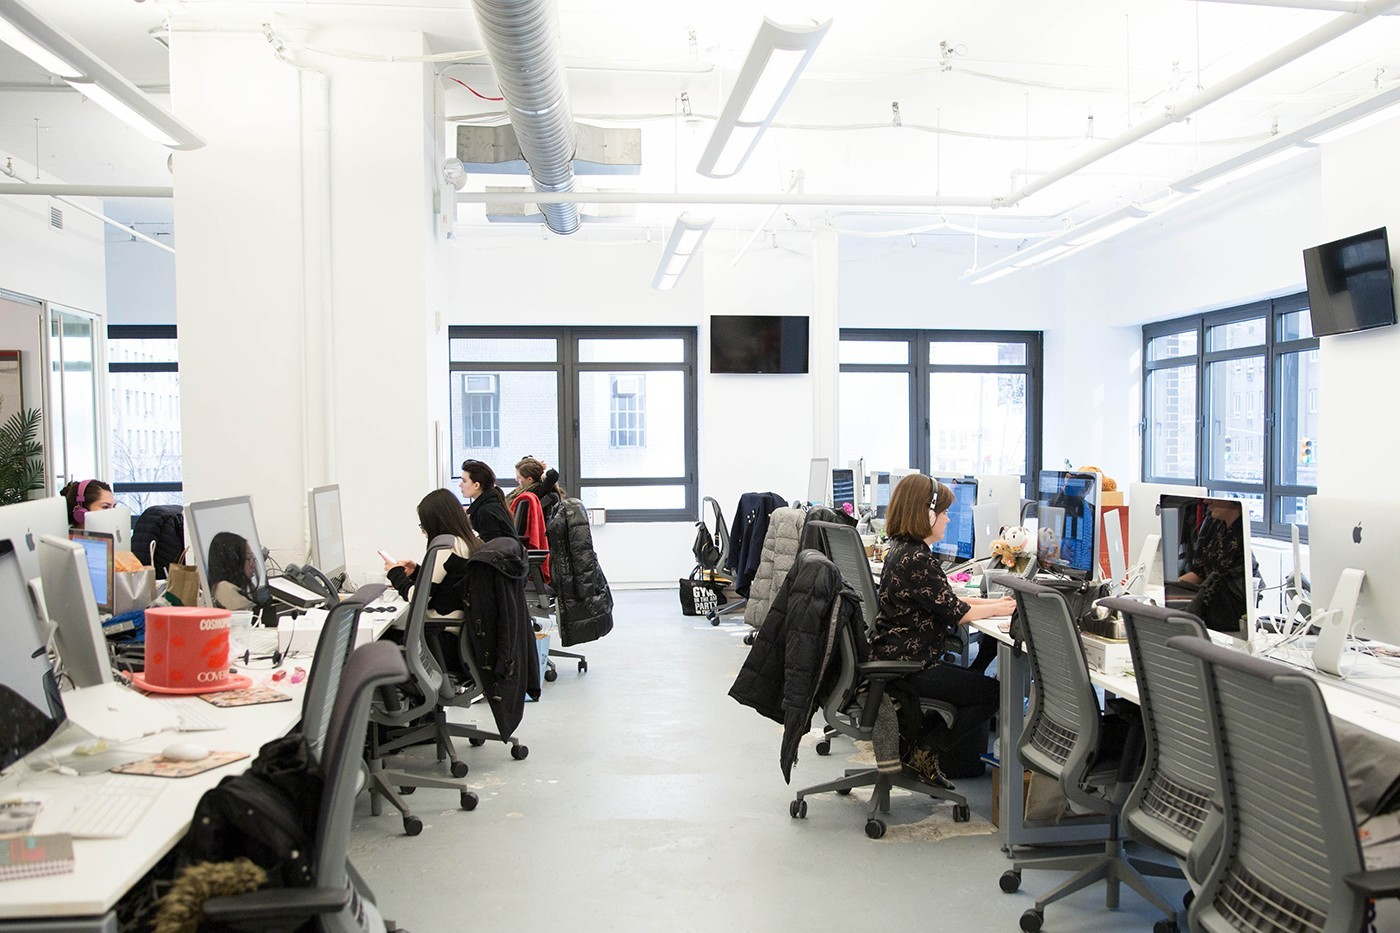 09-cosmopolitancom-office